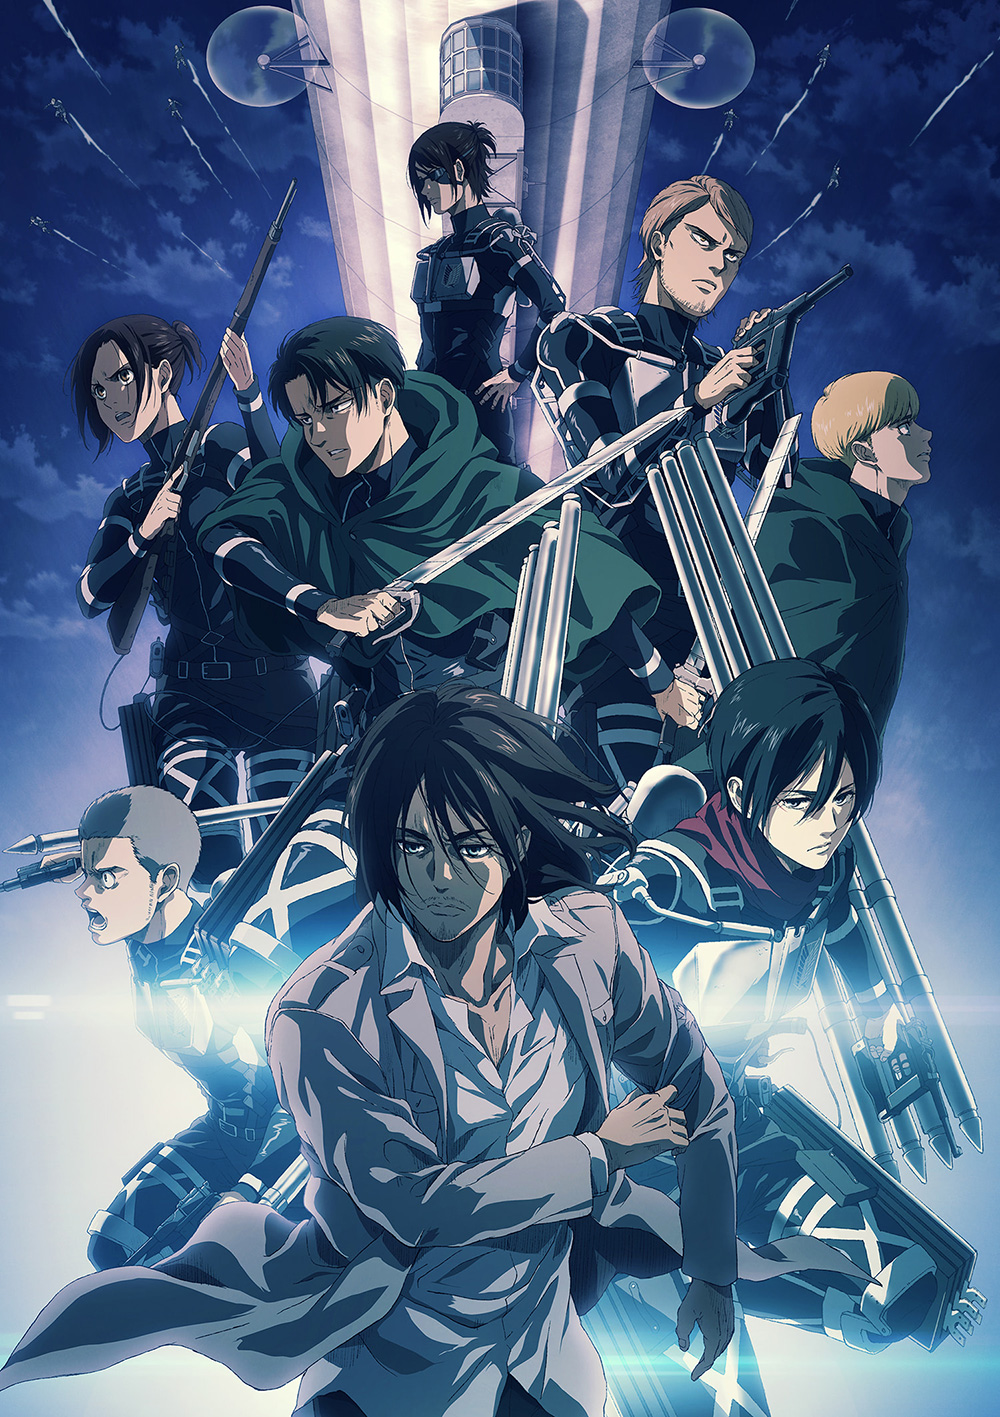 Attack-on-Titan-The-Final-Season-Visual-04